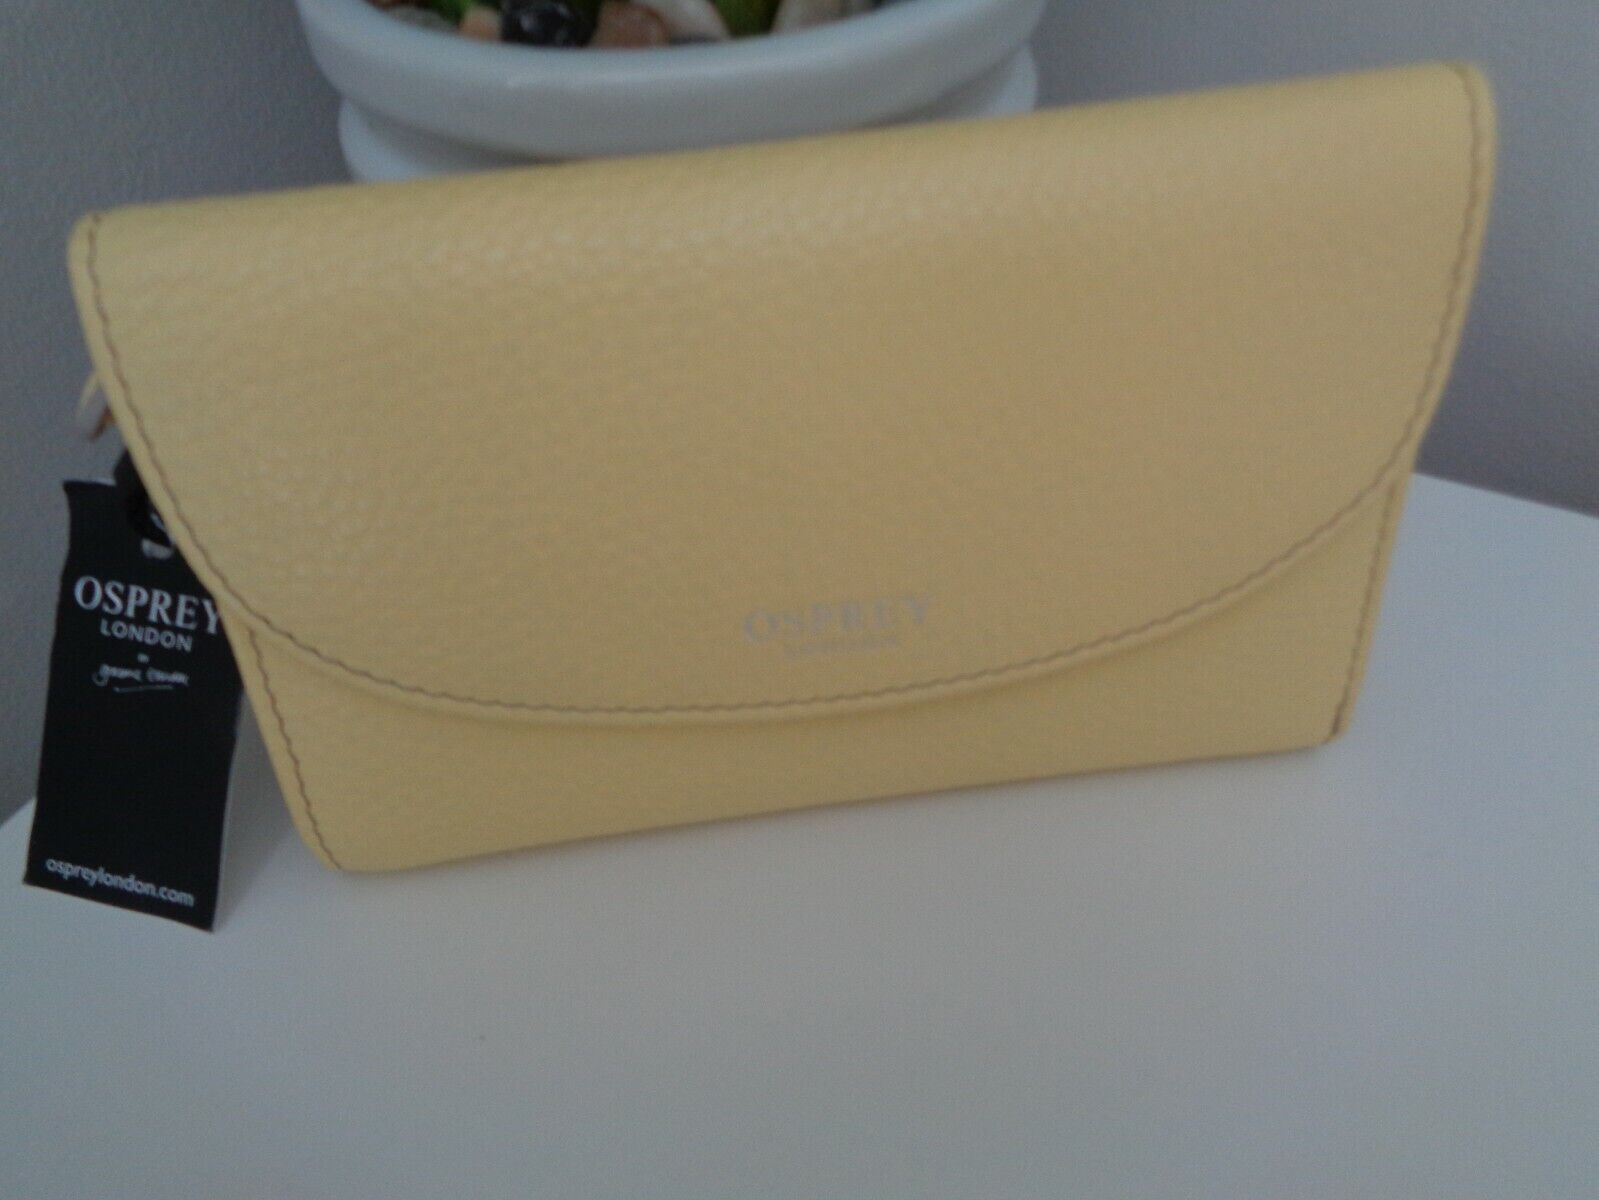 BNWT Osprey OSP 107 Yellow Leather Purse Wallet